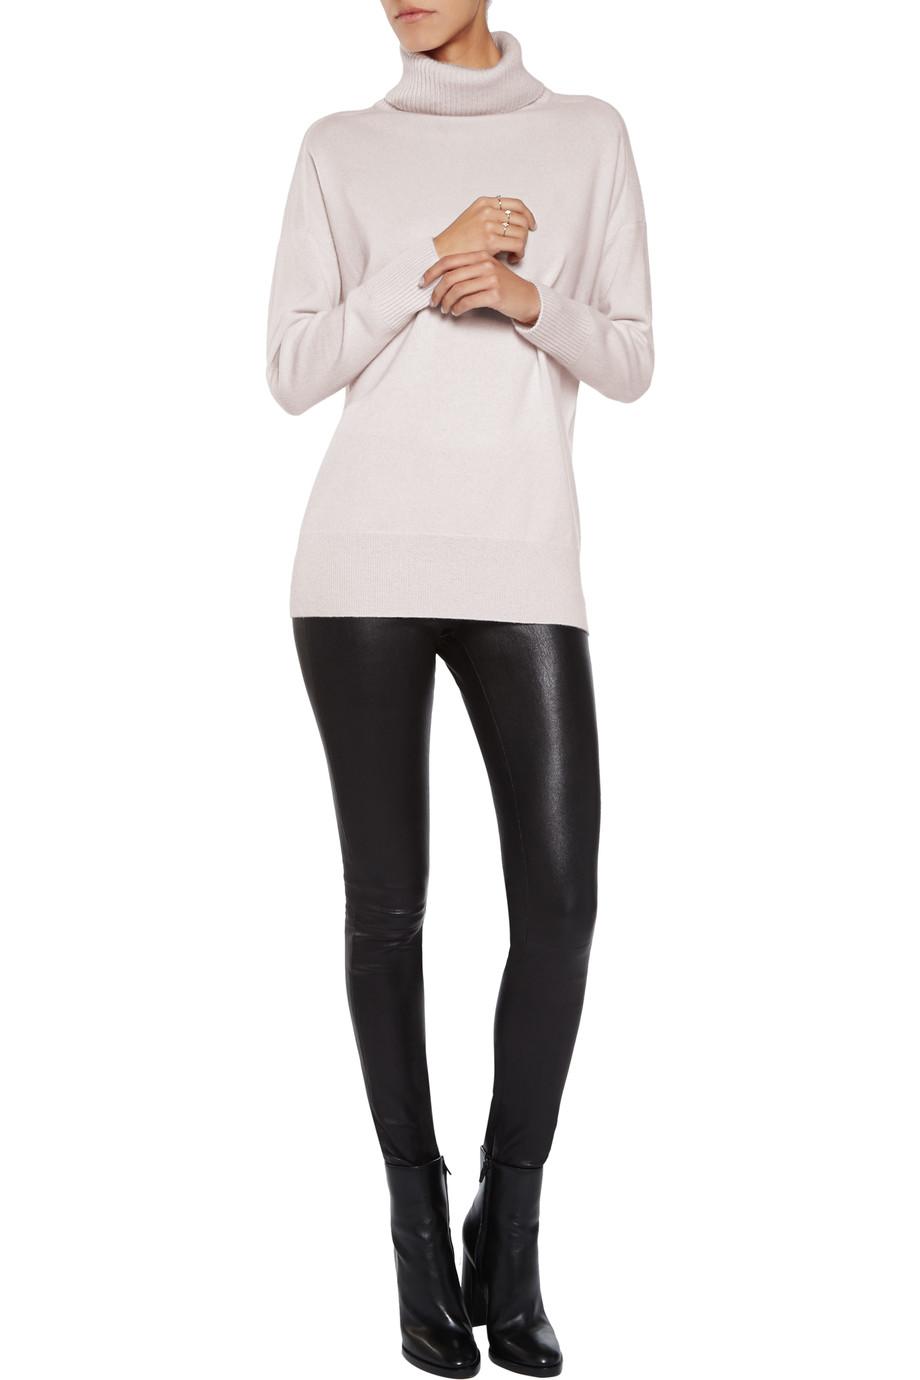 The Iris & Ink Grace Turtleneck Sweater in neutral